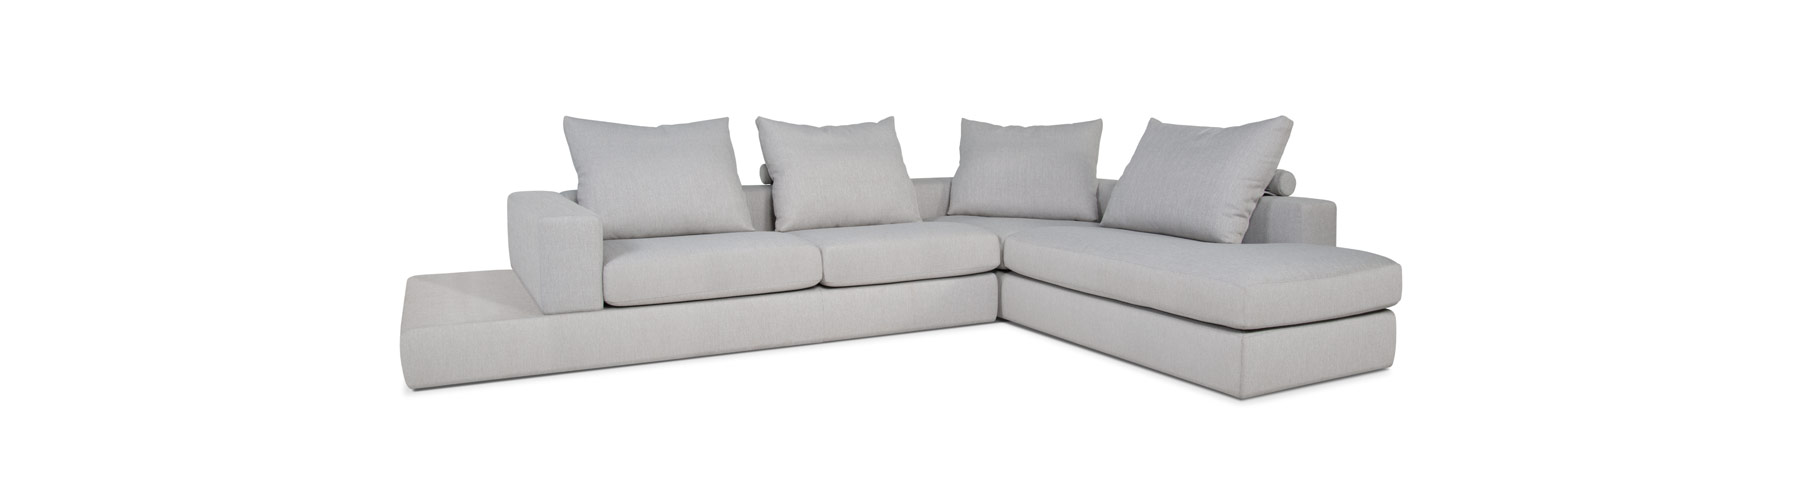 Lounge - Modulaire William